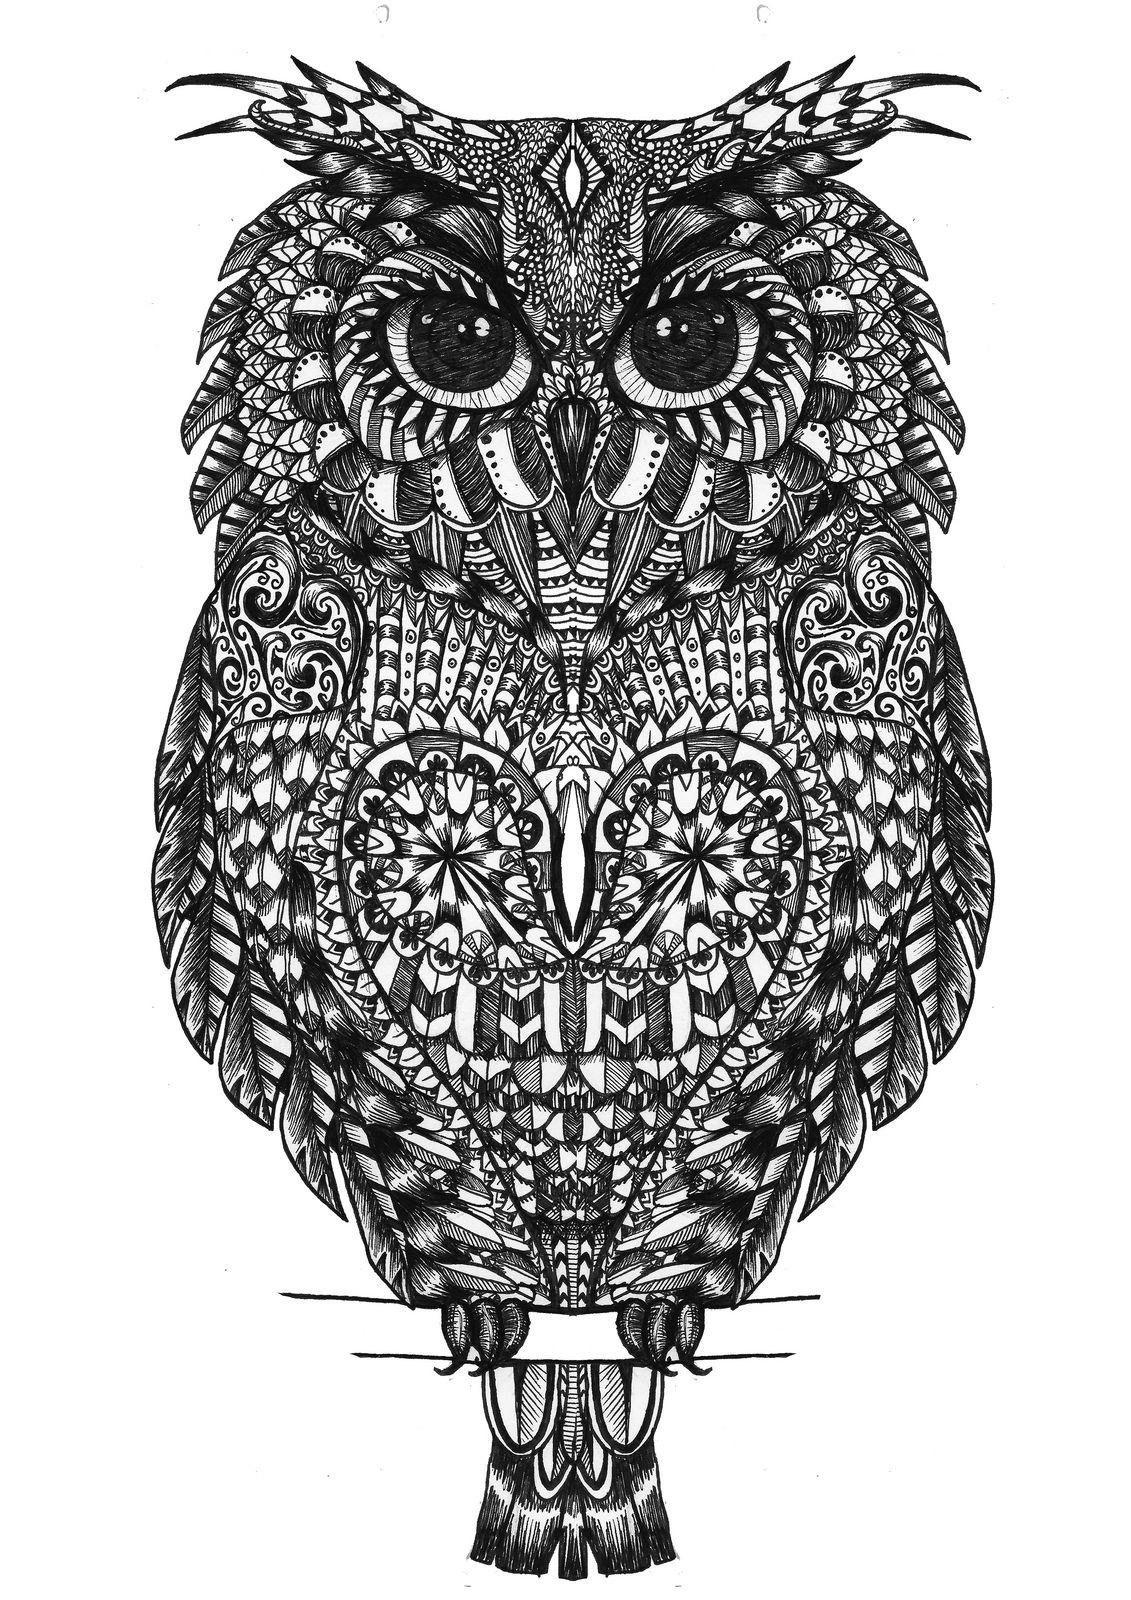 Owl zentangle street art and illustrations